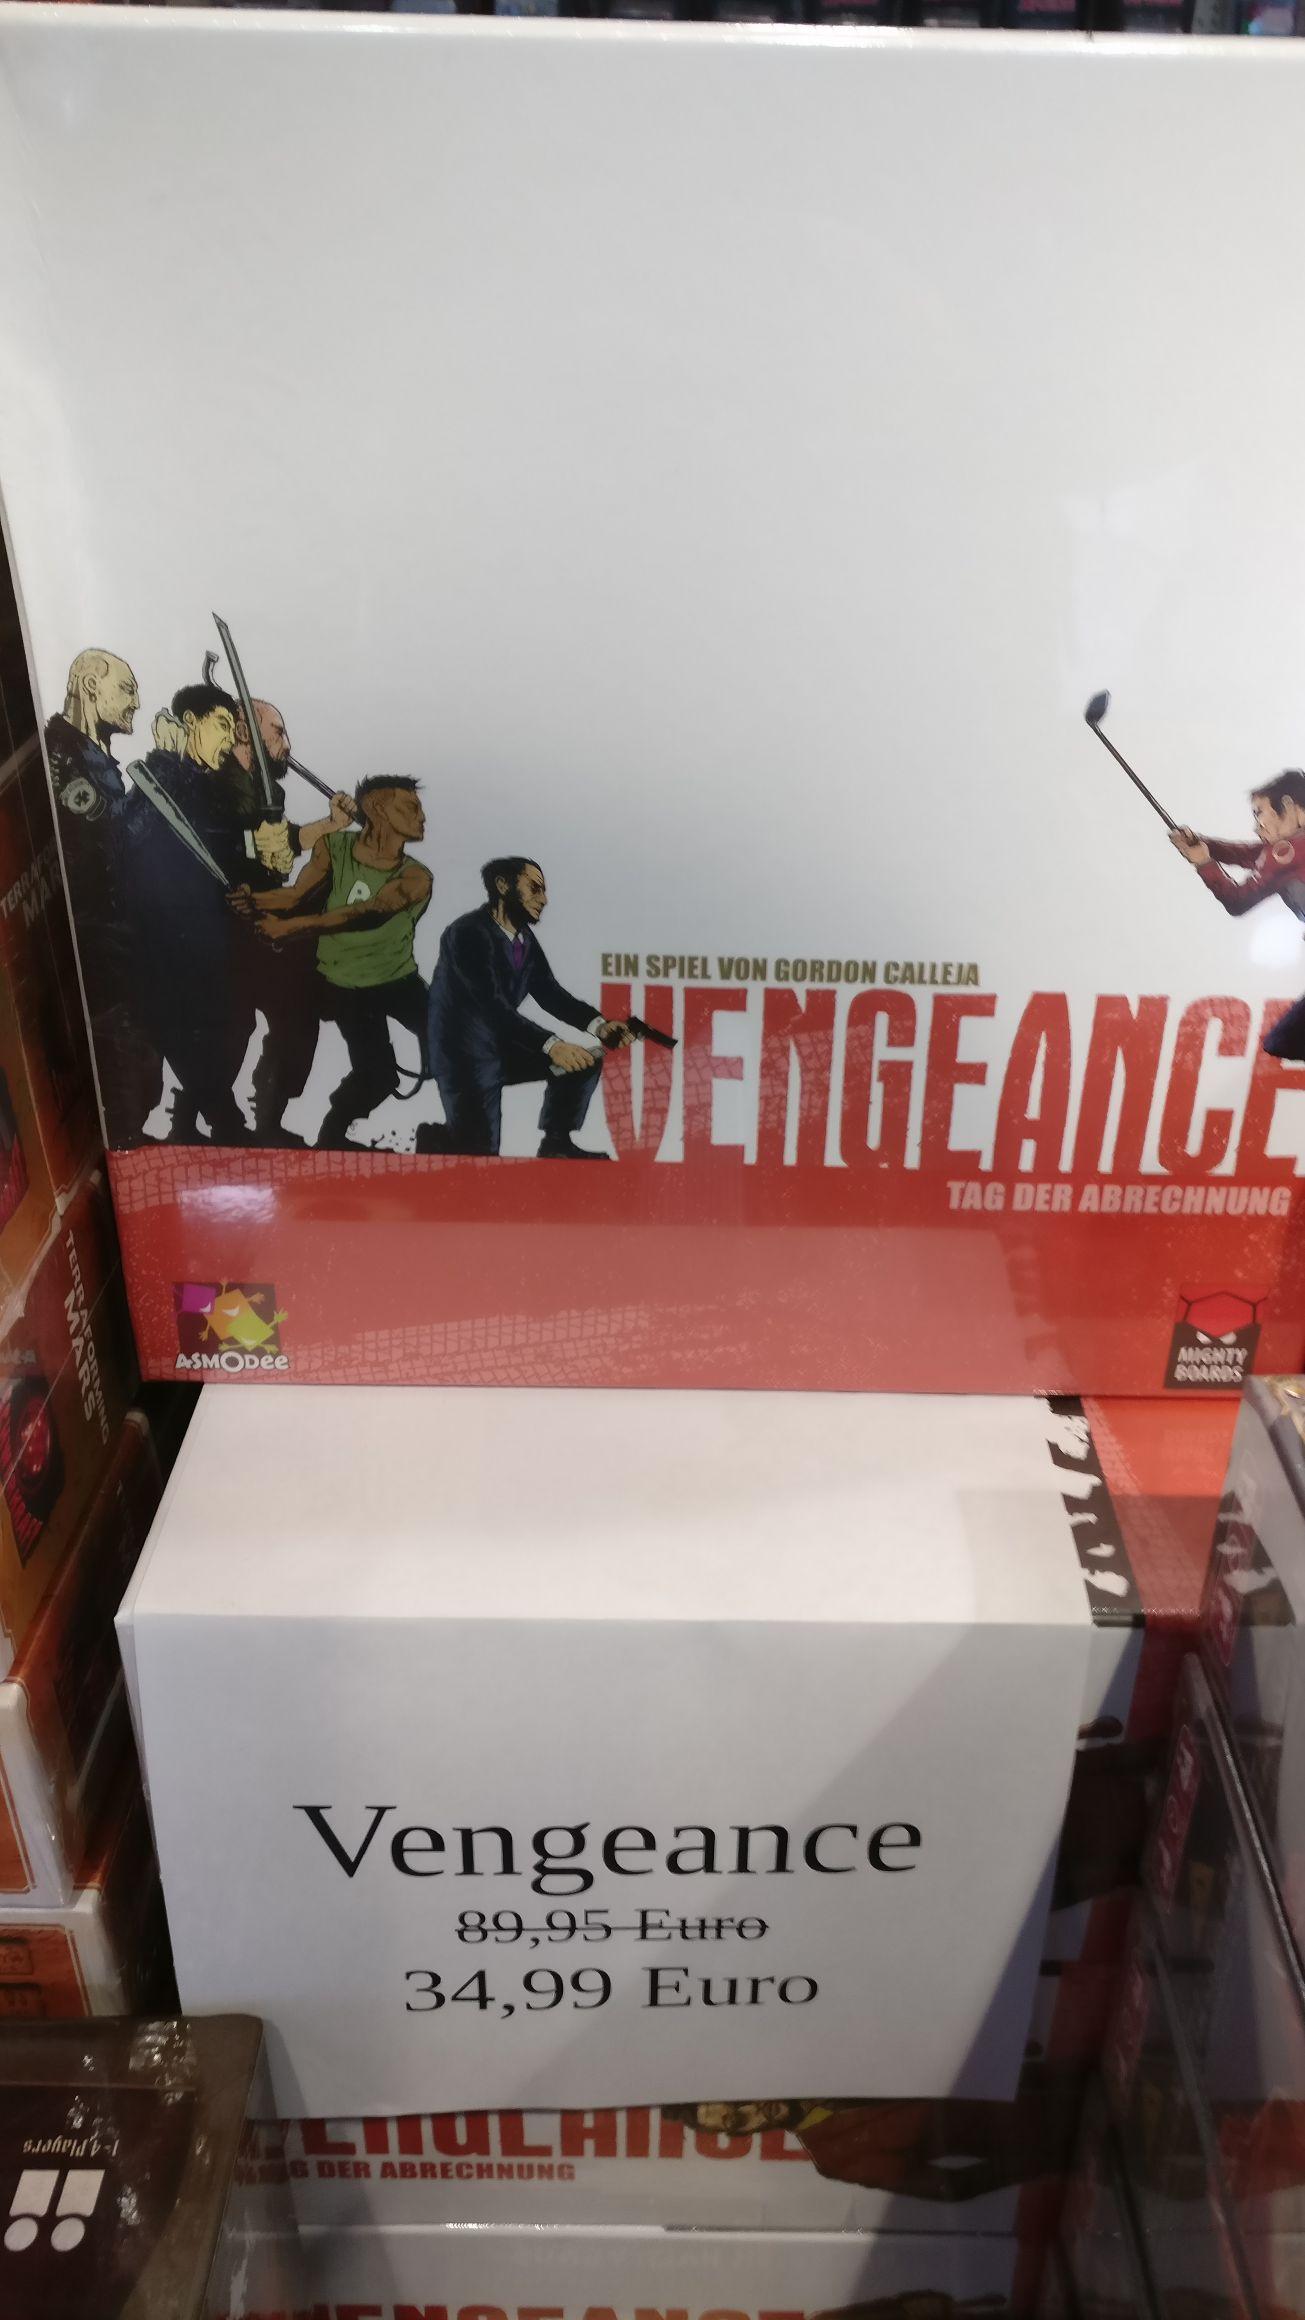 Vengeance Brettspiel